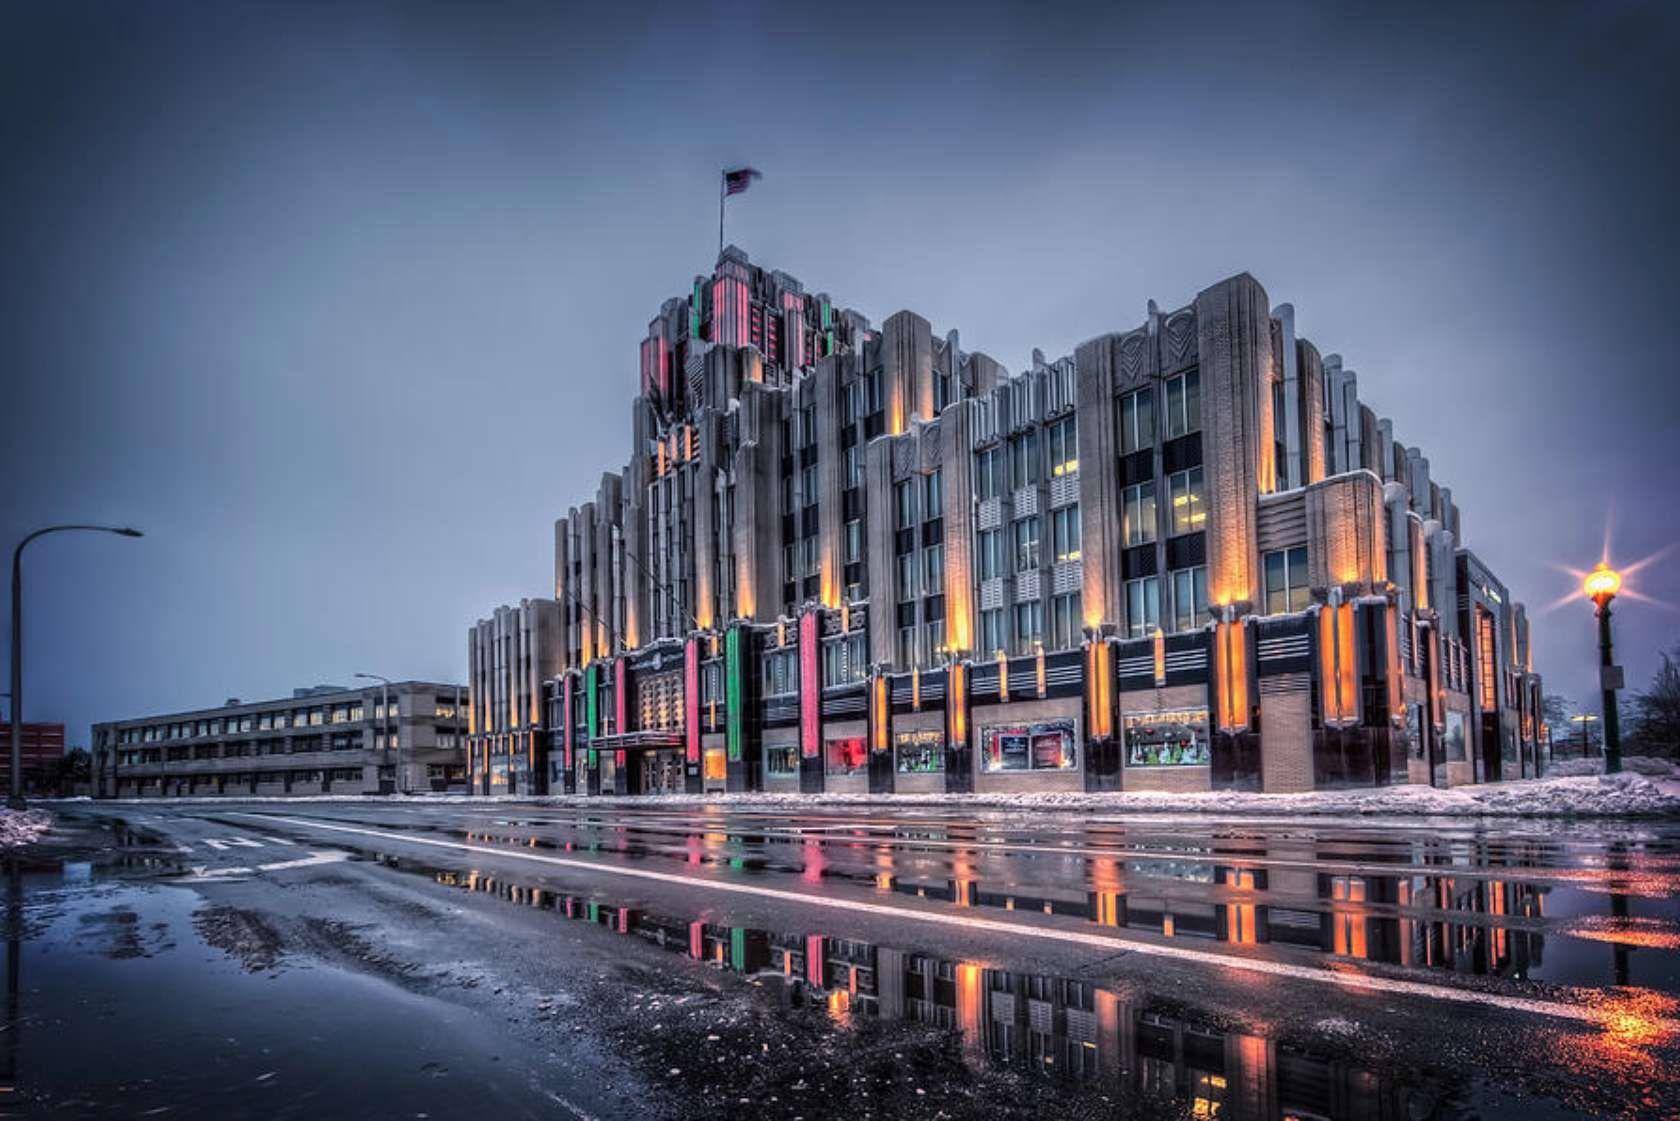 niagara mohawk building (1932) designedmelvin l. king and bley